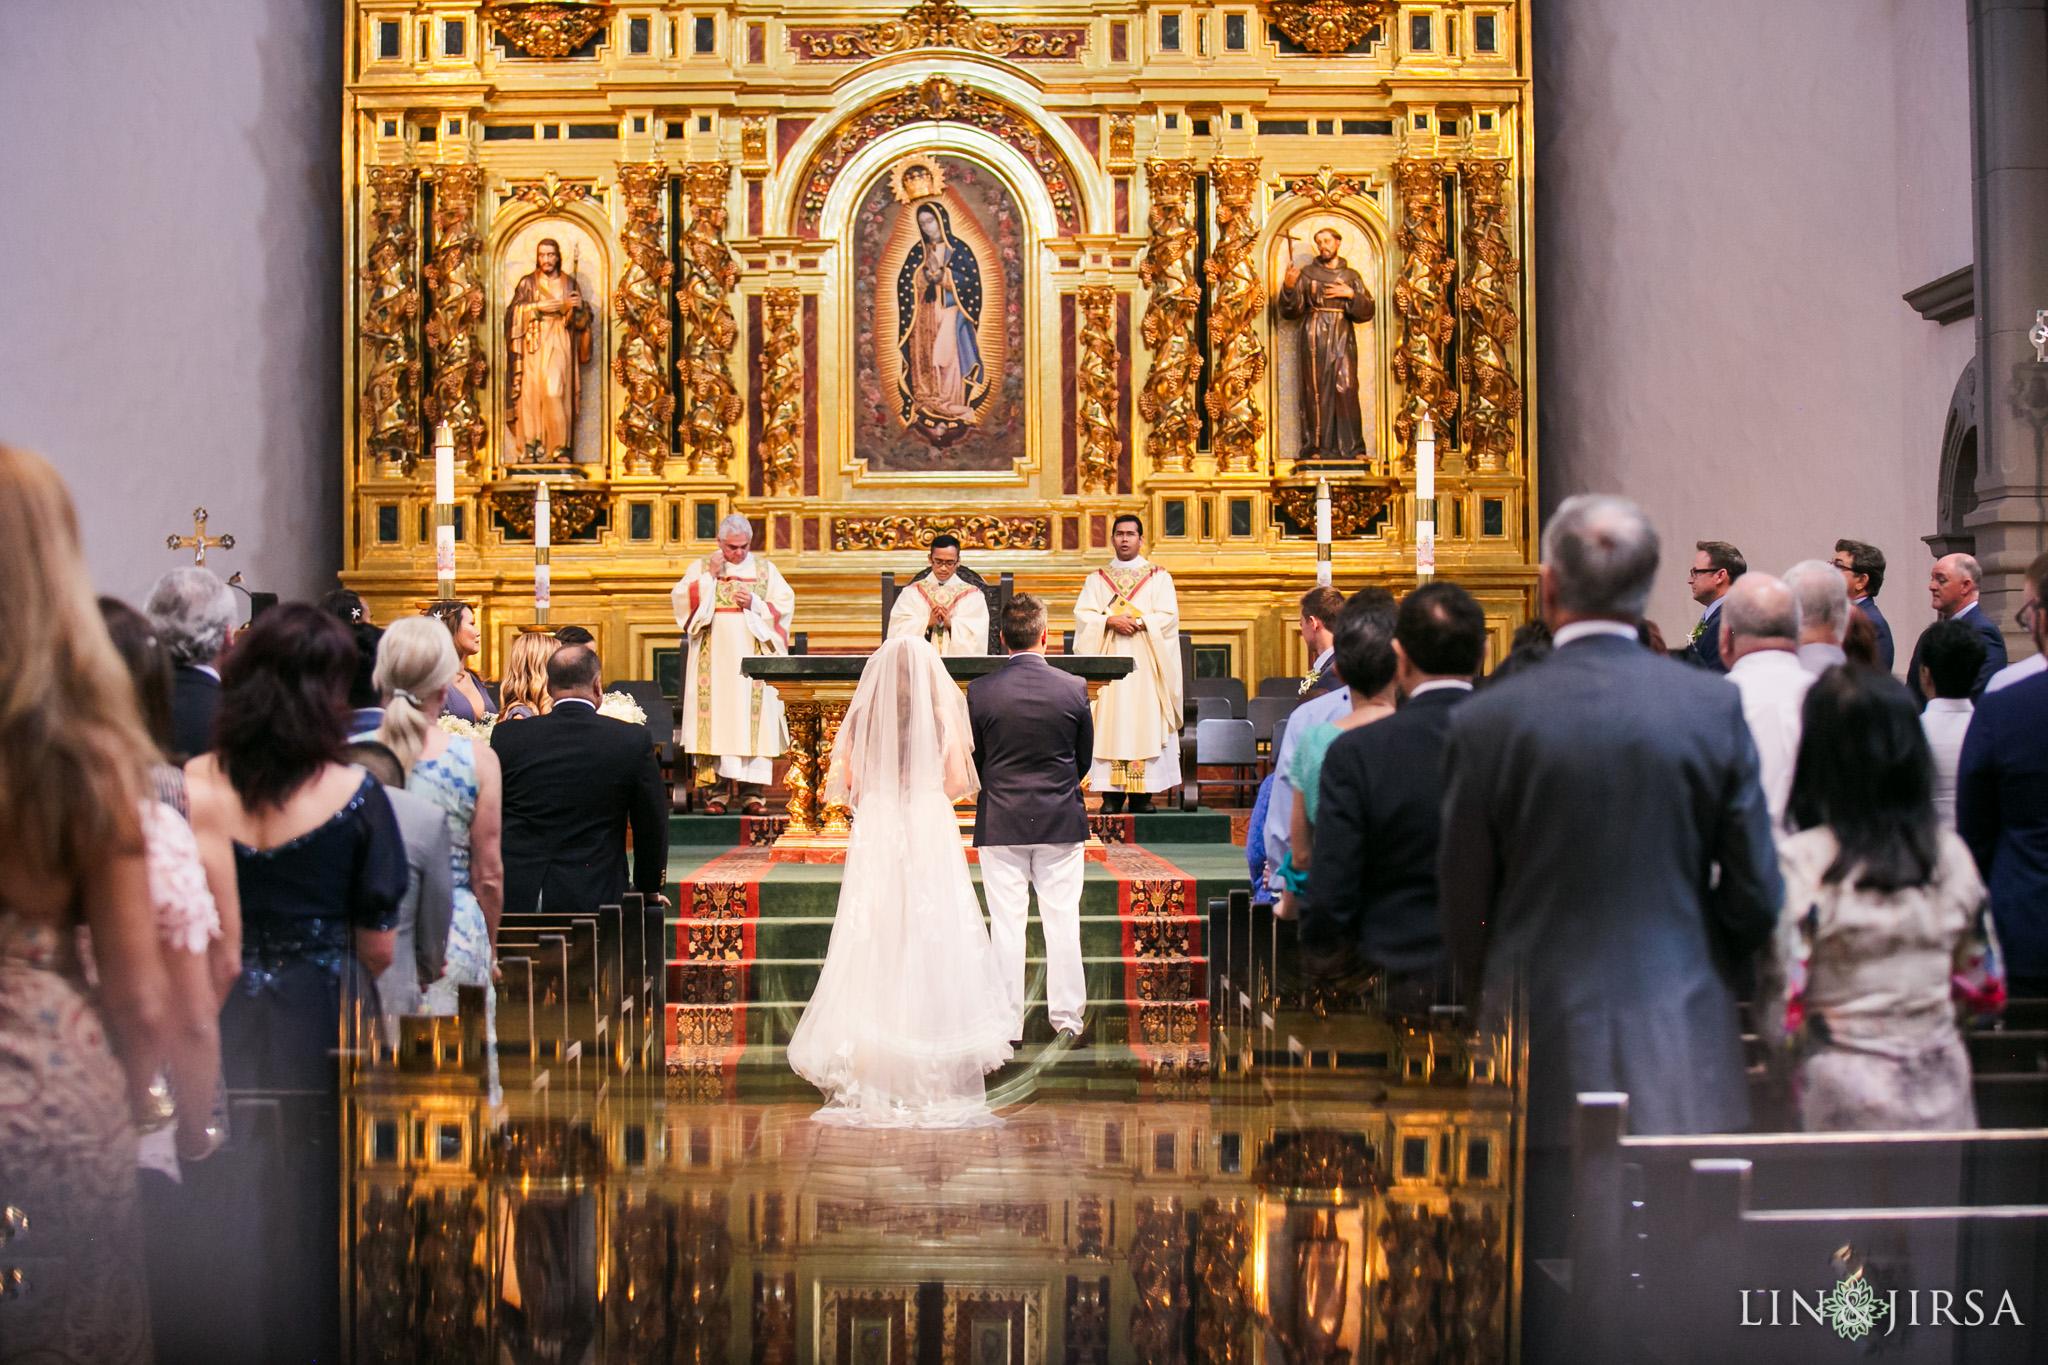 014 mission basilica san juan capistrano wedding ceremony photography